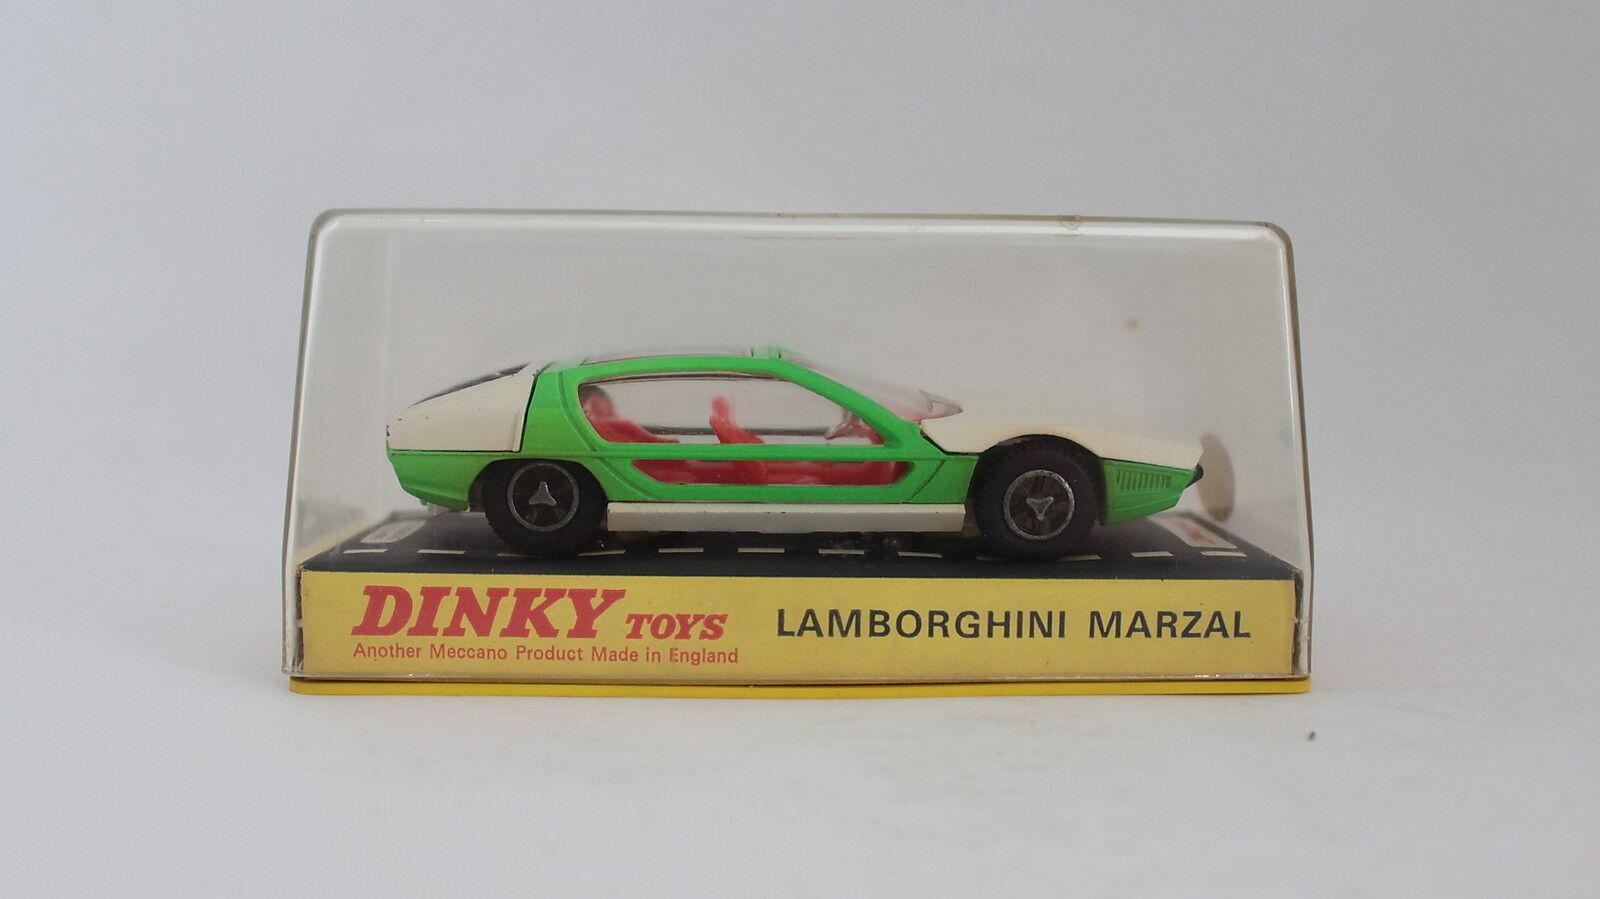 Schäbiges spielzeug 189 lamborghini marzal - made in england - meccano ltd - nib [or3-5]